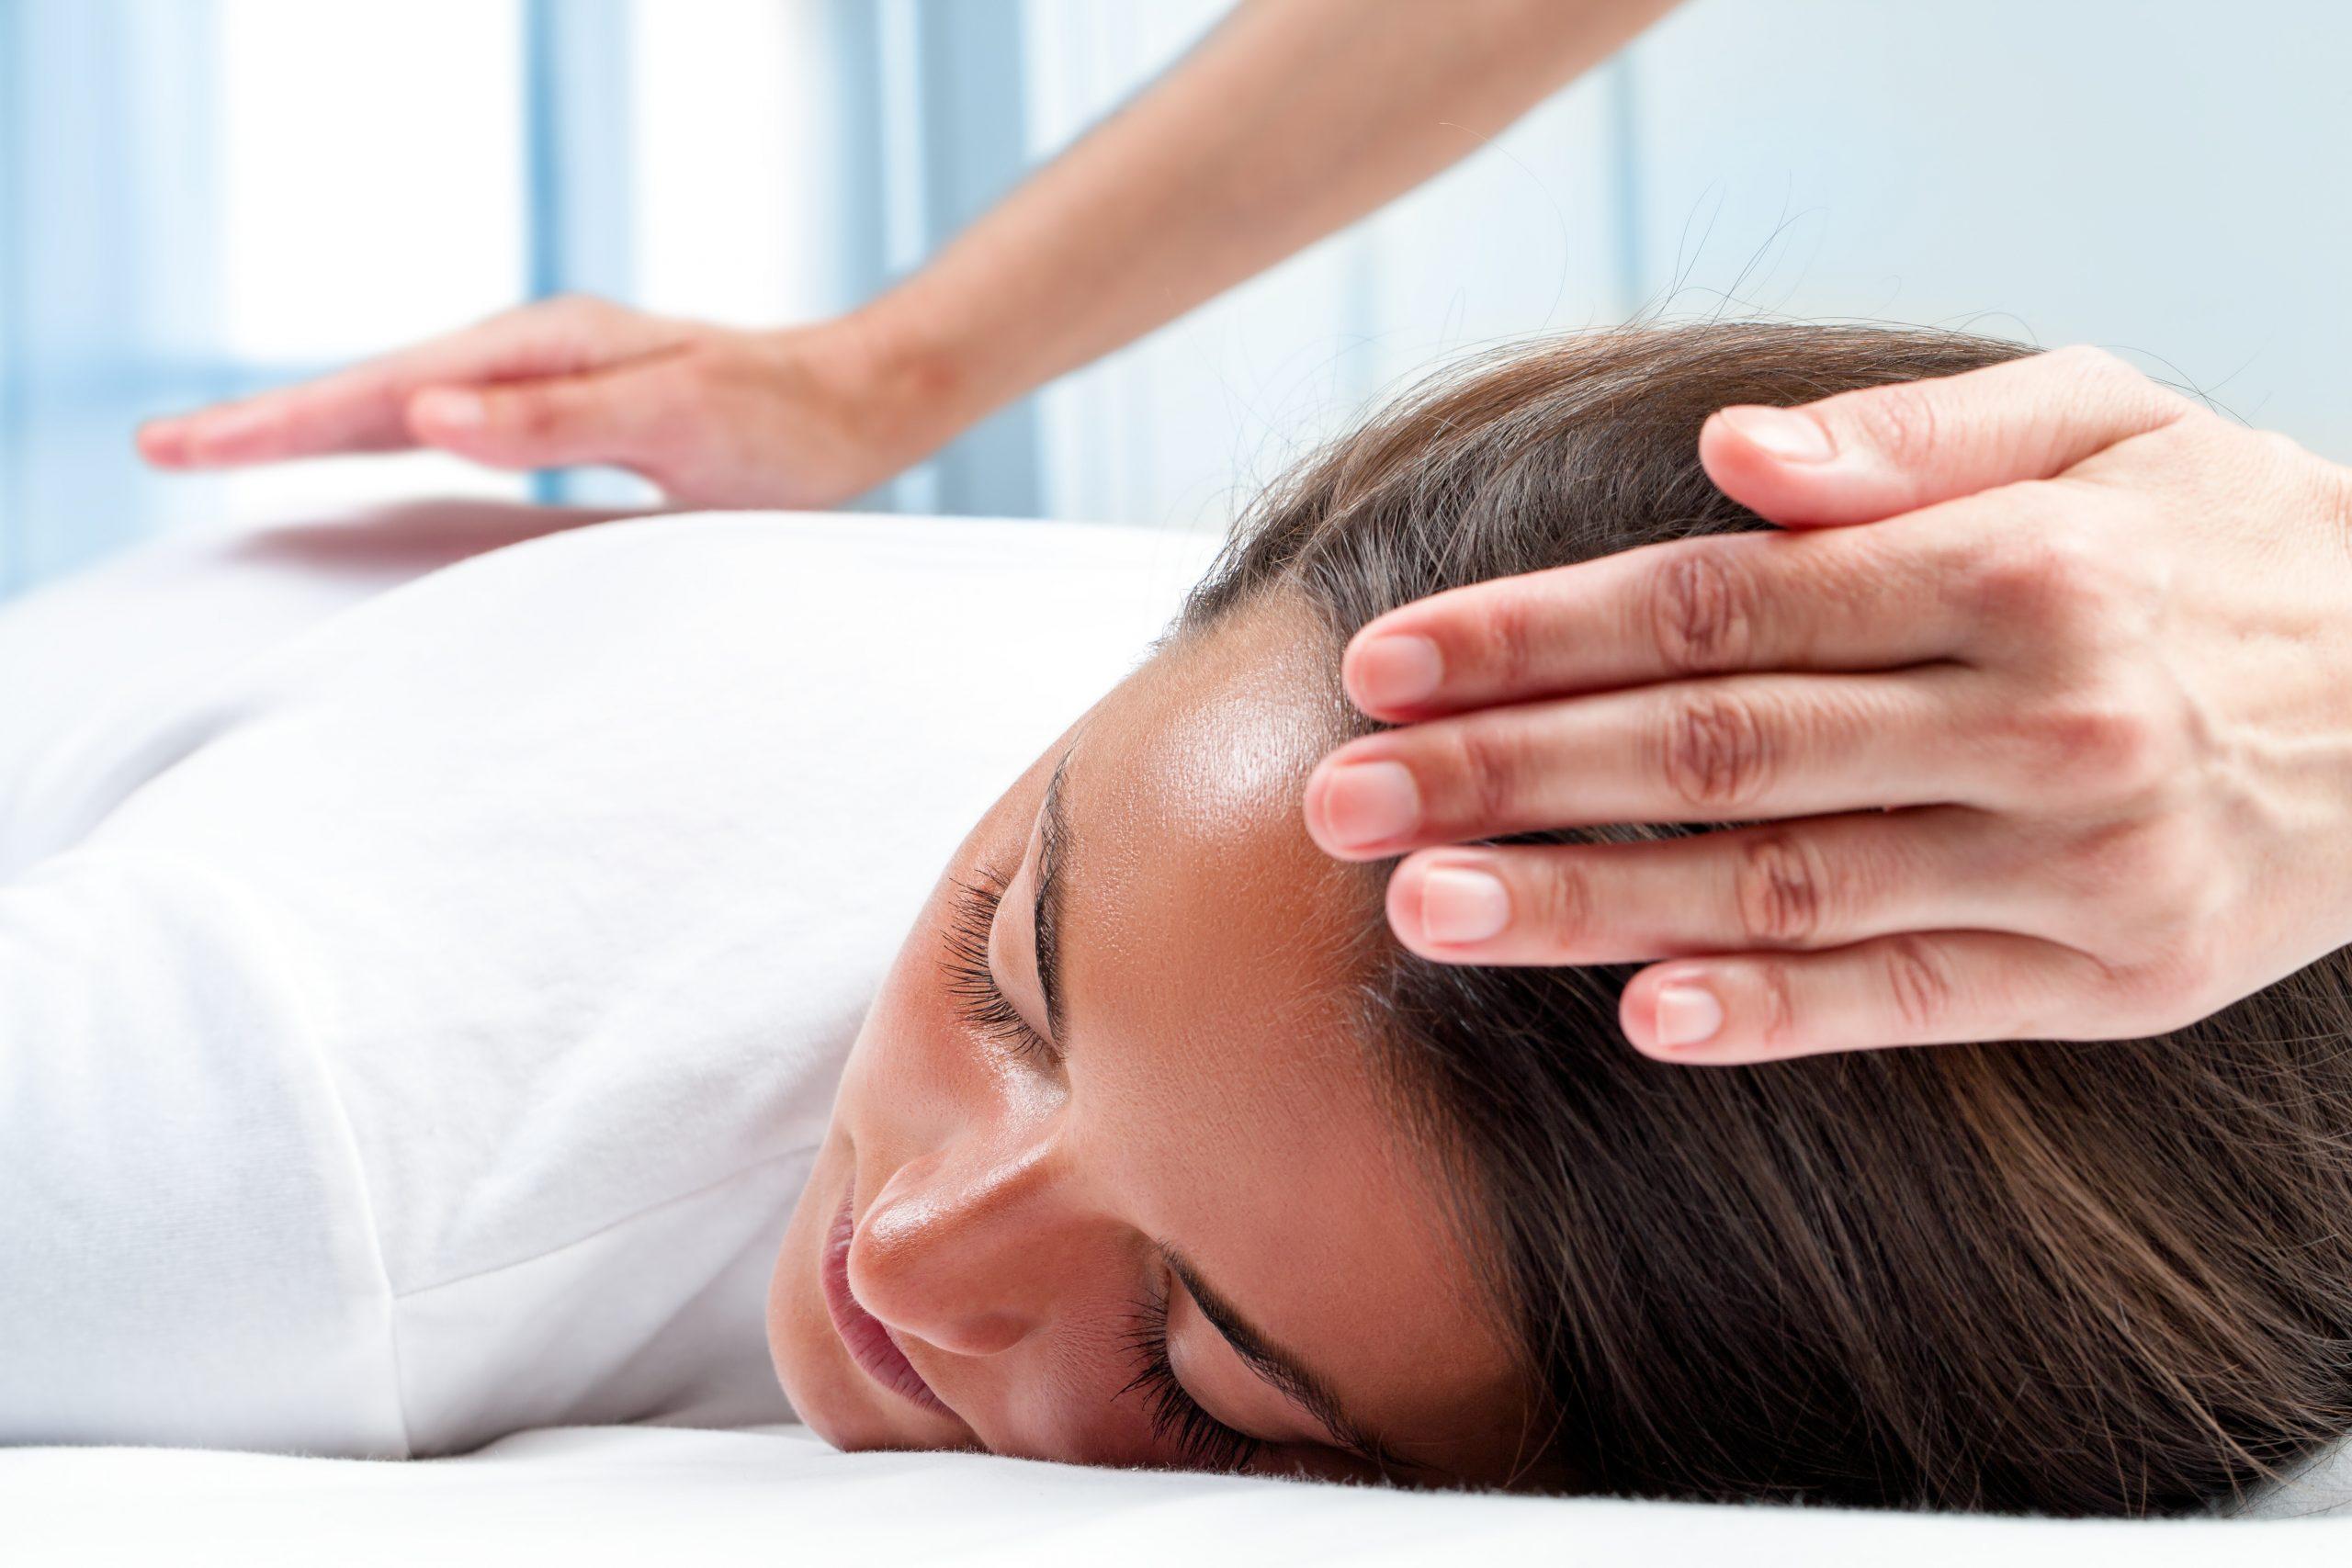 Healing & Wellbeing